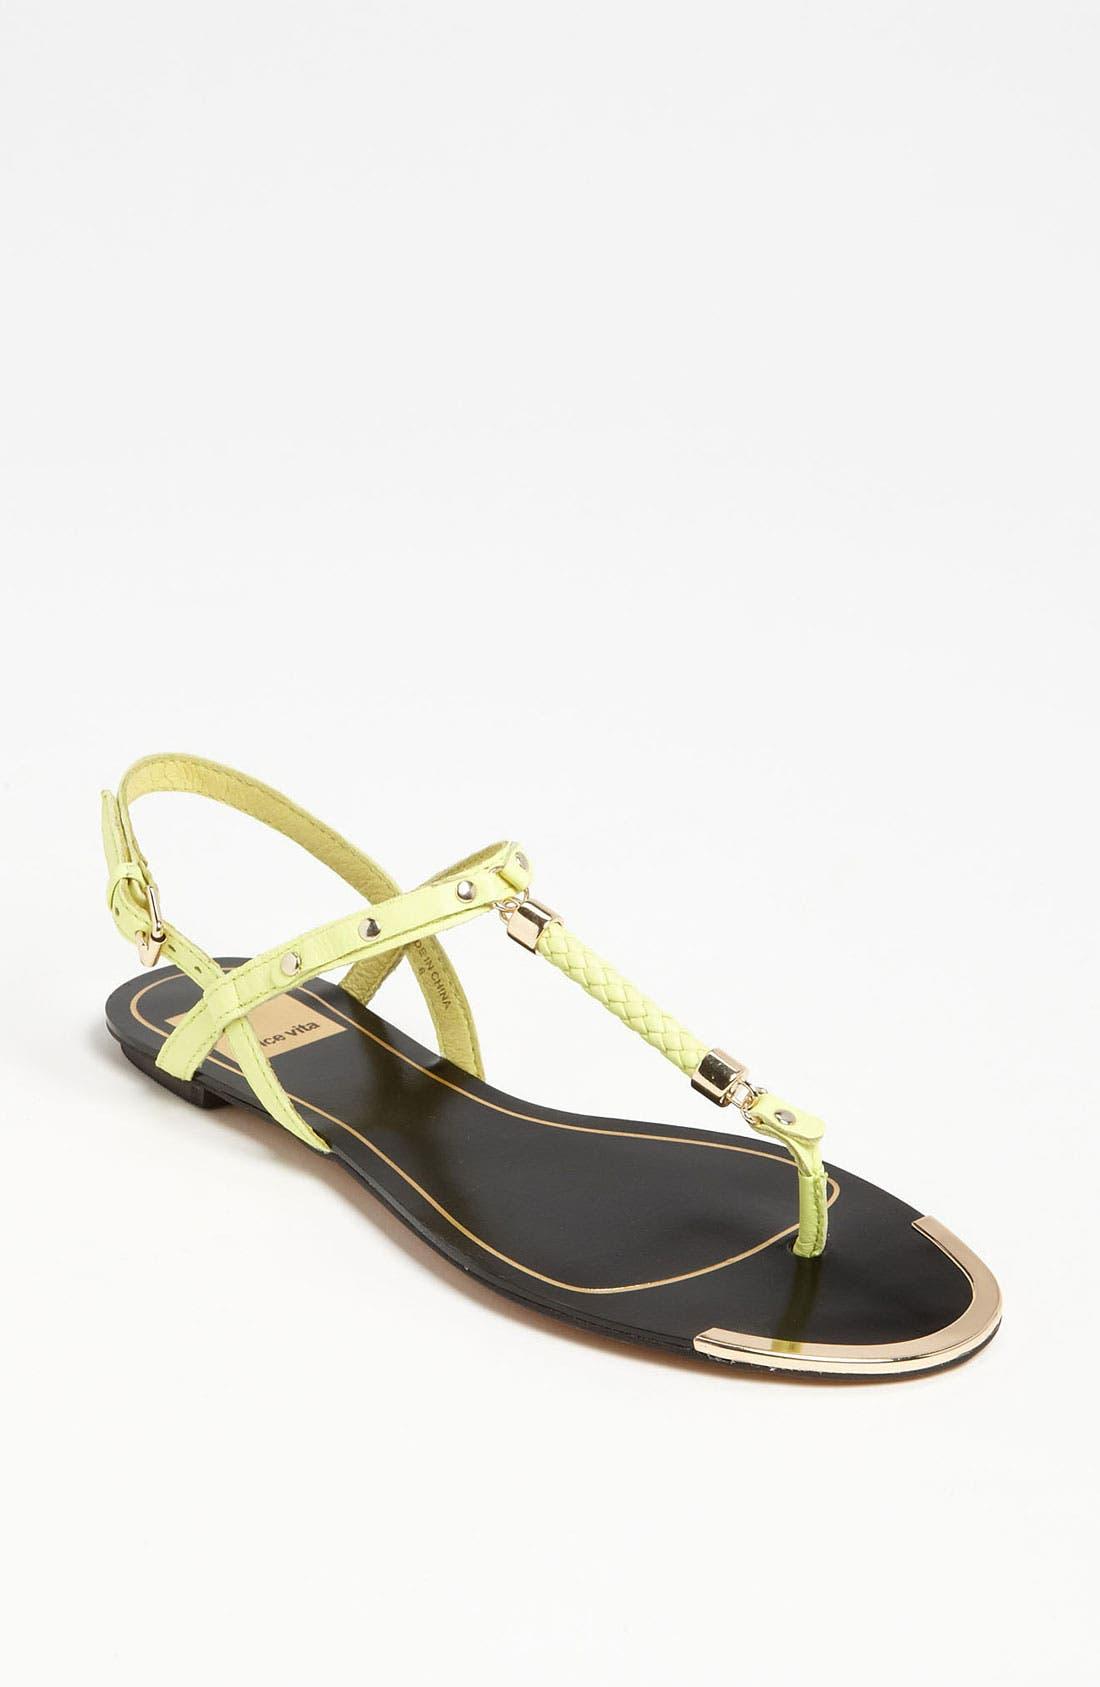 Alternate Image 1 Selected - Dolce Vita 'Dia' Sandal